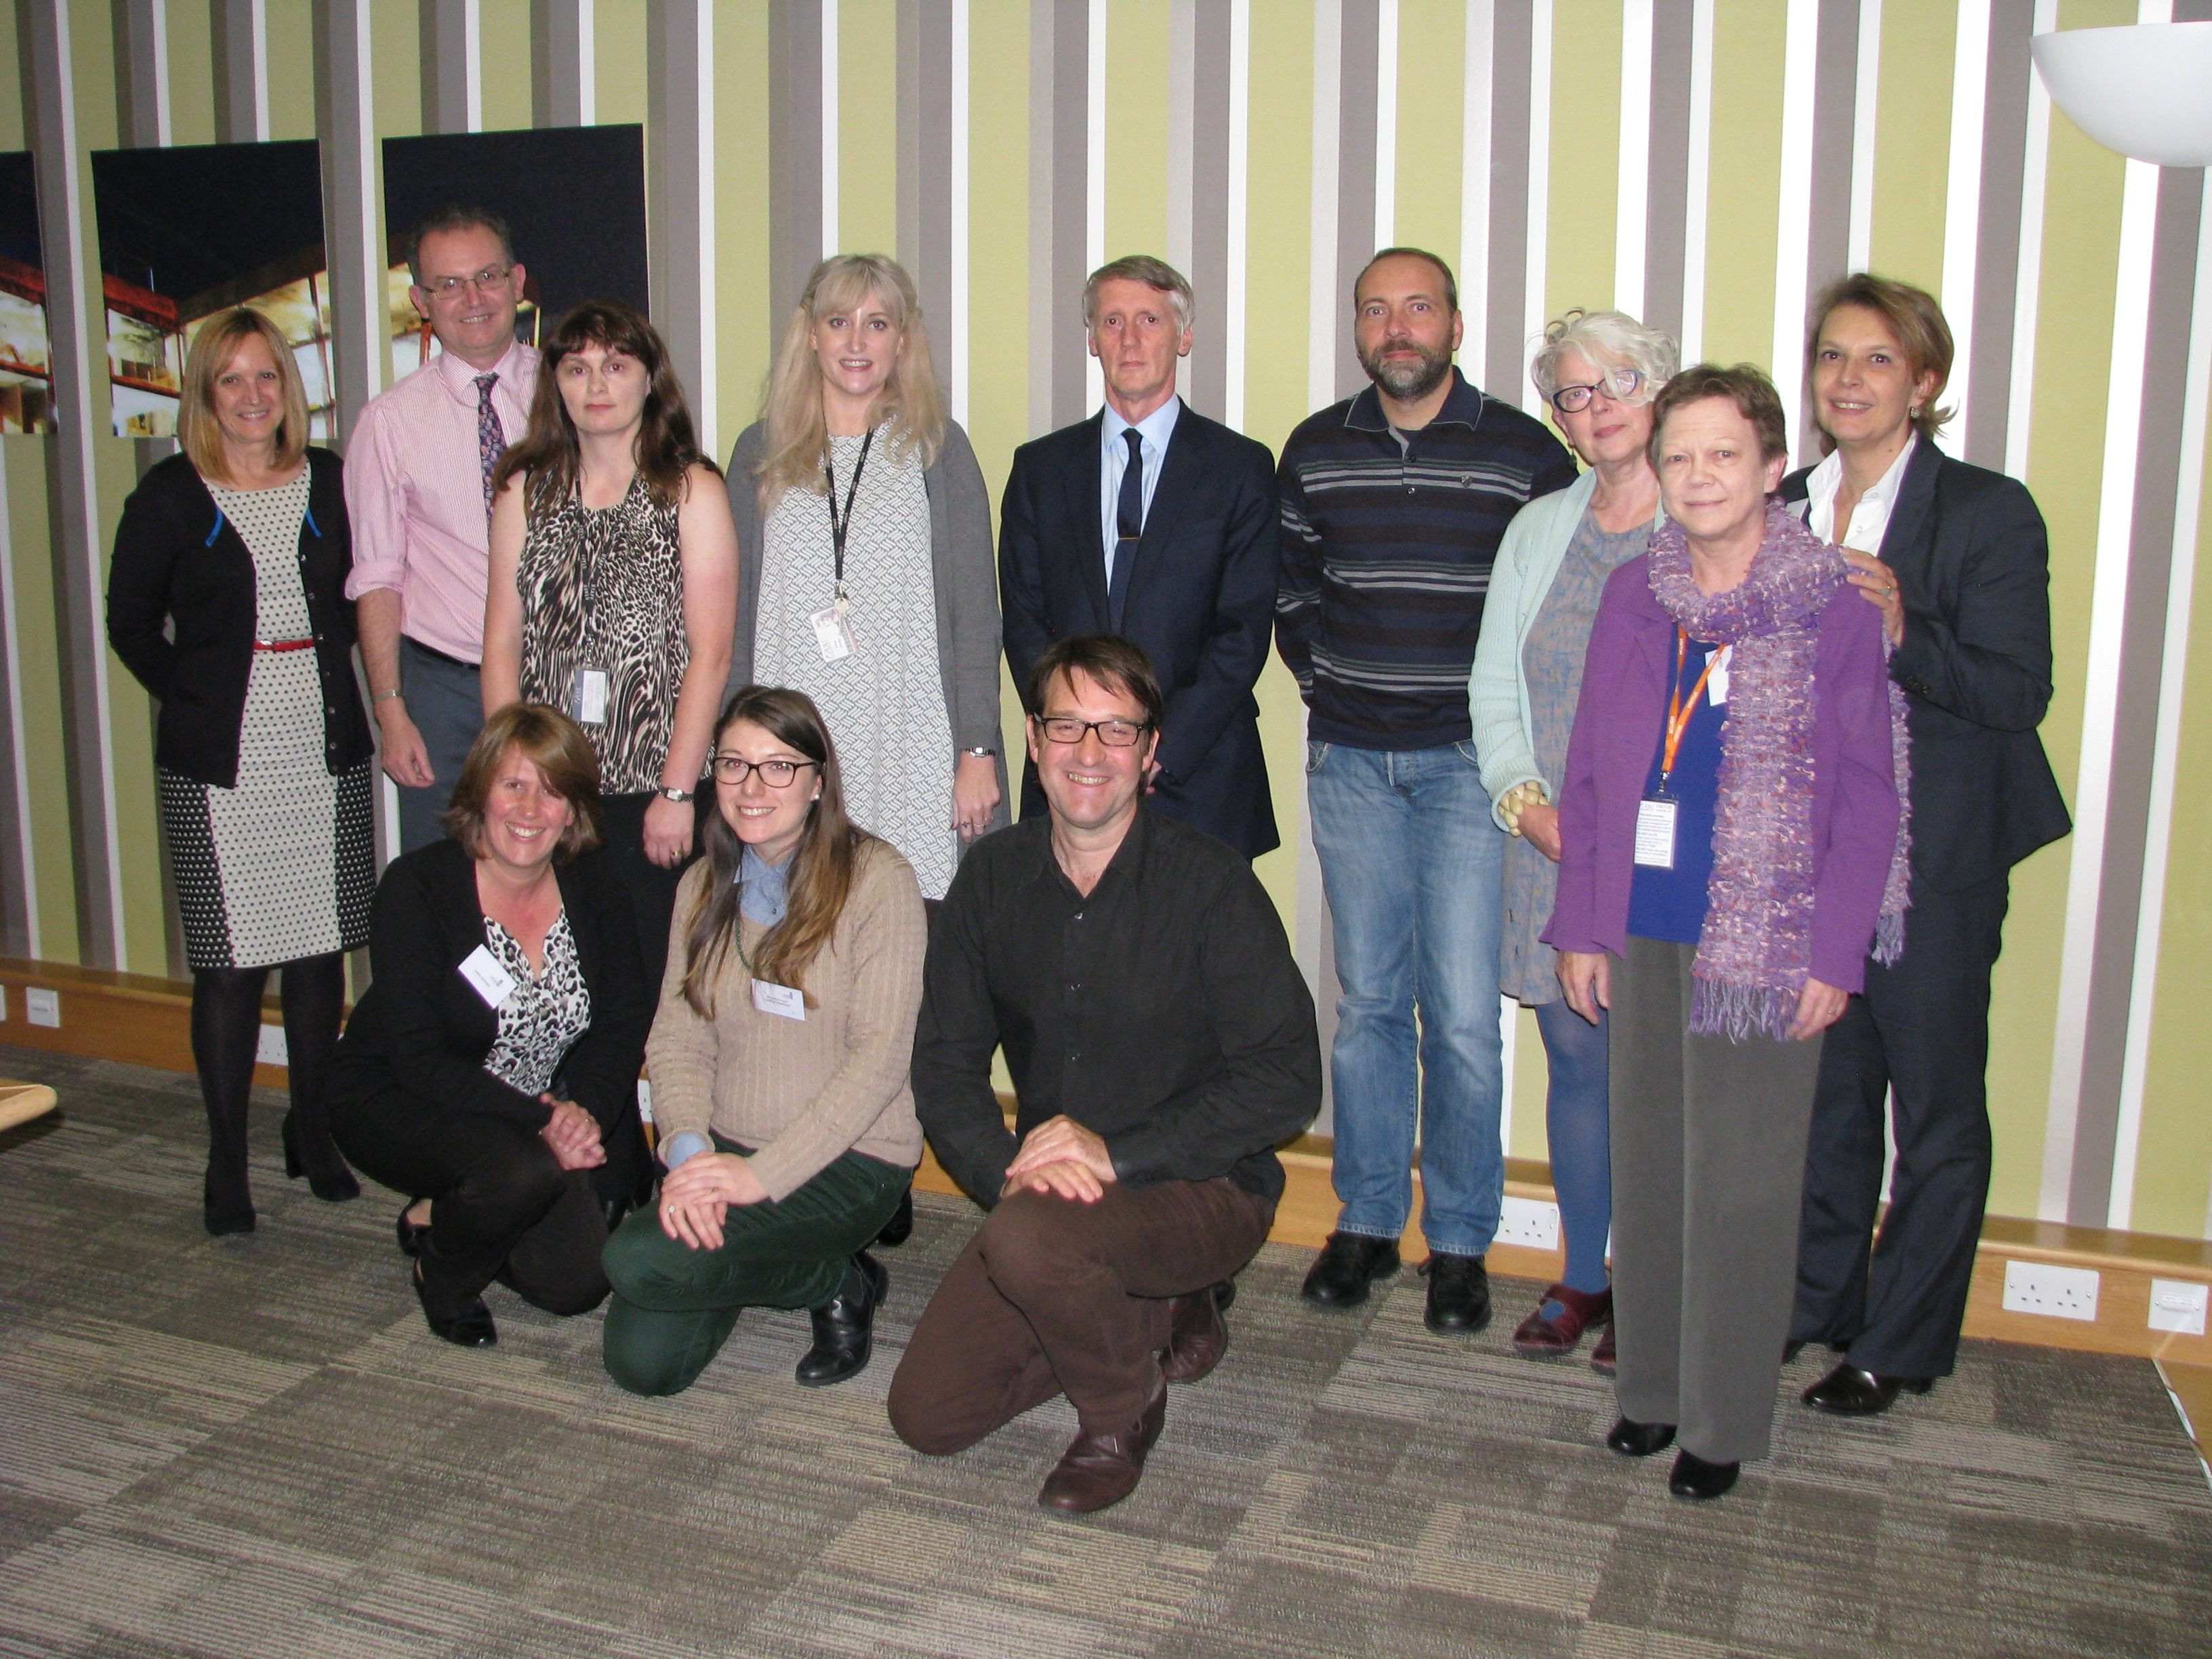 pirkko-varis-and-other-smartour-team-members